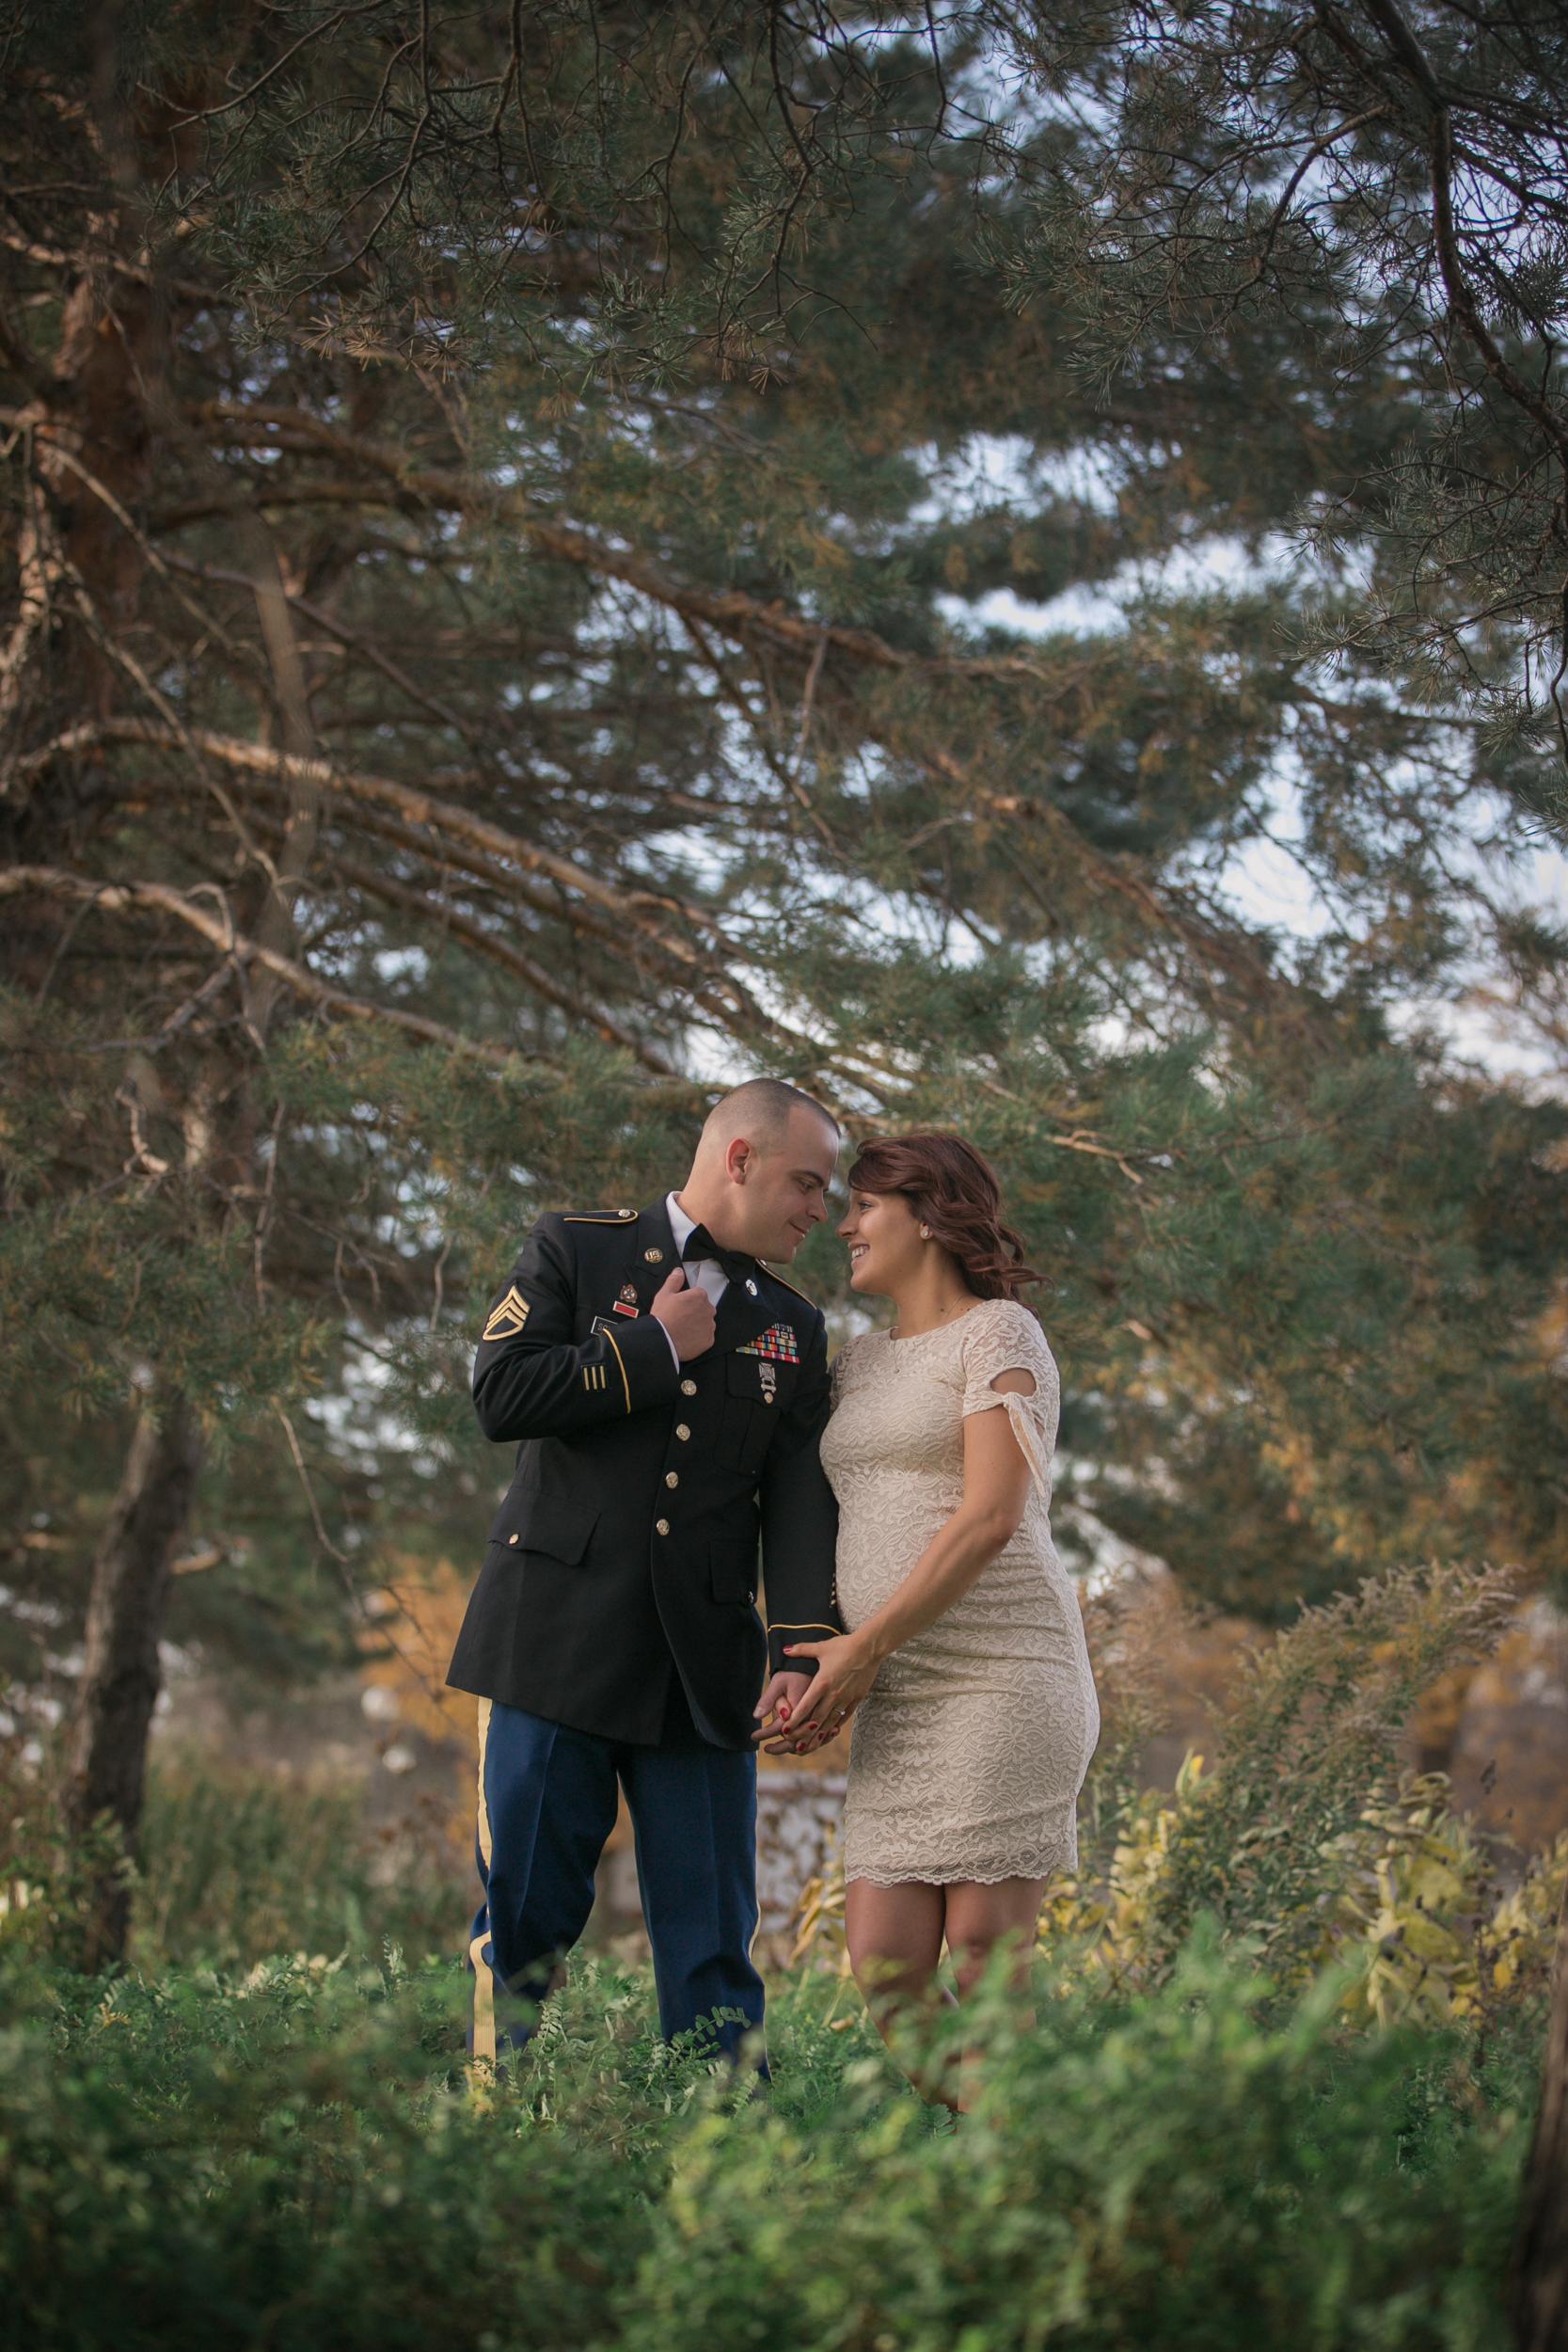 Fort Snelling Elopement St. Paul, MN, Fort Snelling Elopement, Military Elopement, Intimate Military Wedding, intimate elopement wedding-www.rachelsmak.com17.jpg